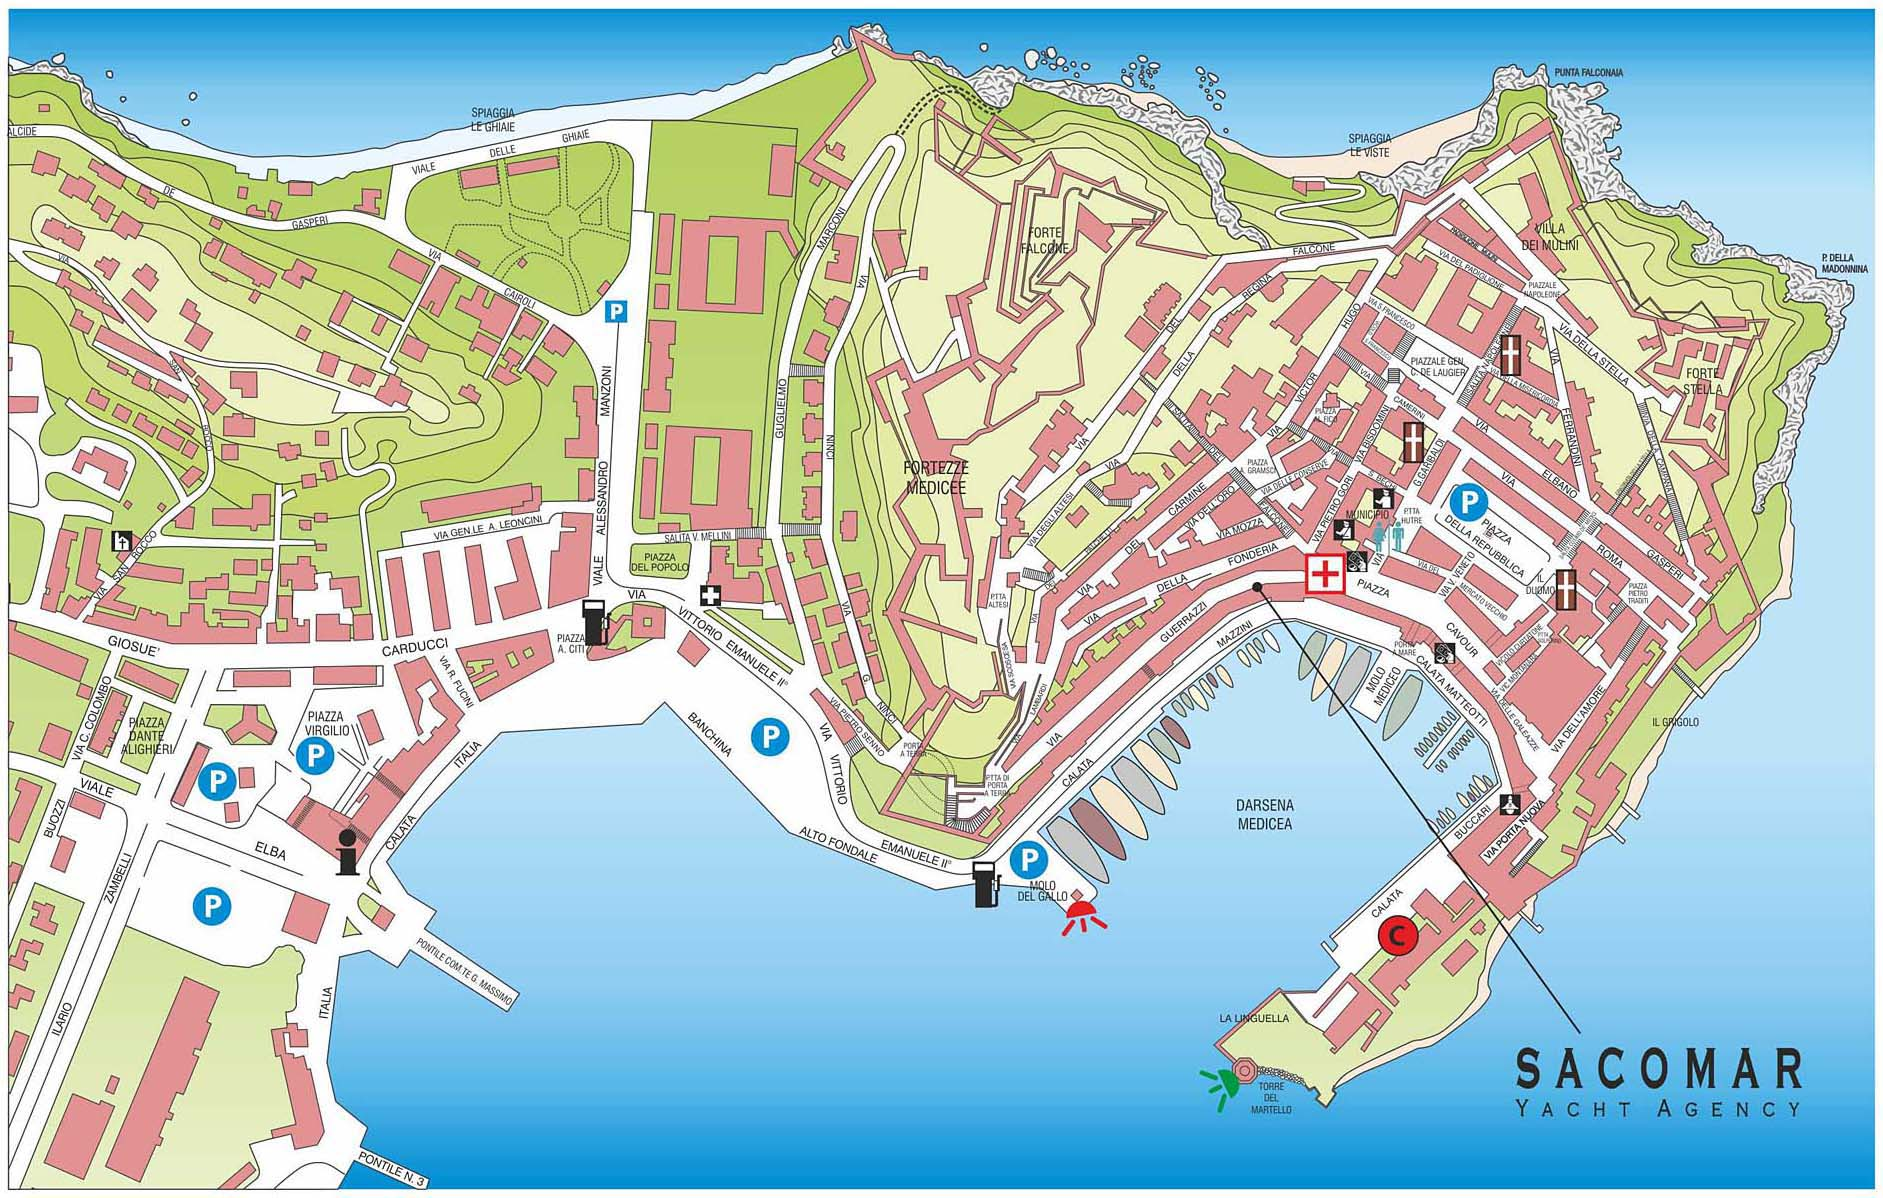 Yacht Agency in Elba Island - Portoferraio Harbour